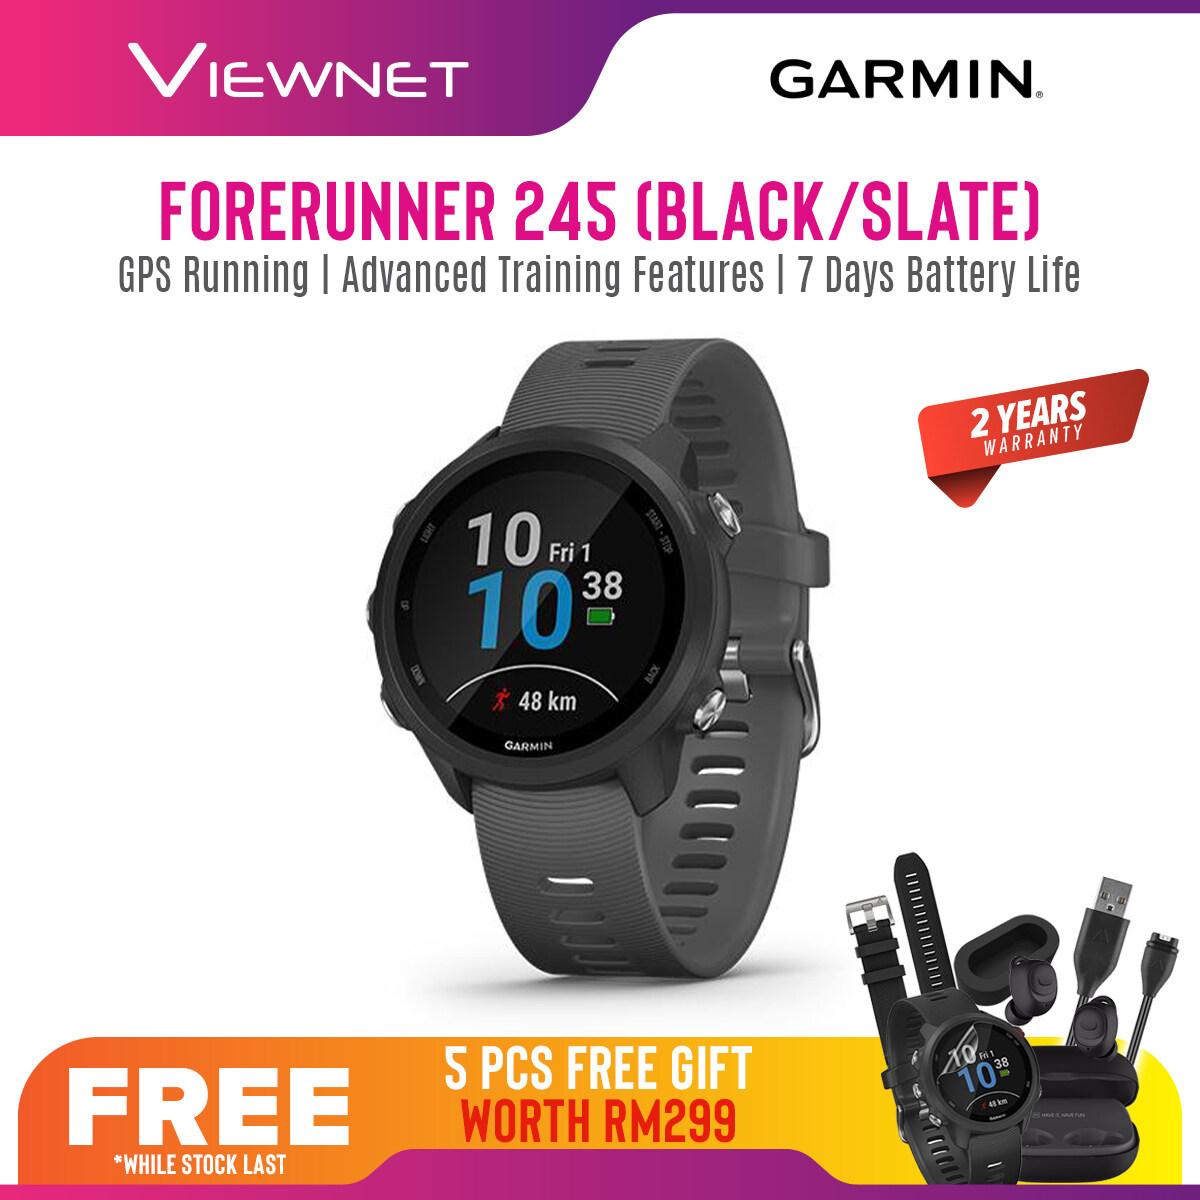 (NEW 2019) Garmin Forerunner 245 / 245 Music GPS Running Smartwatch with Advanced Training Features